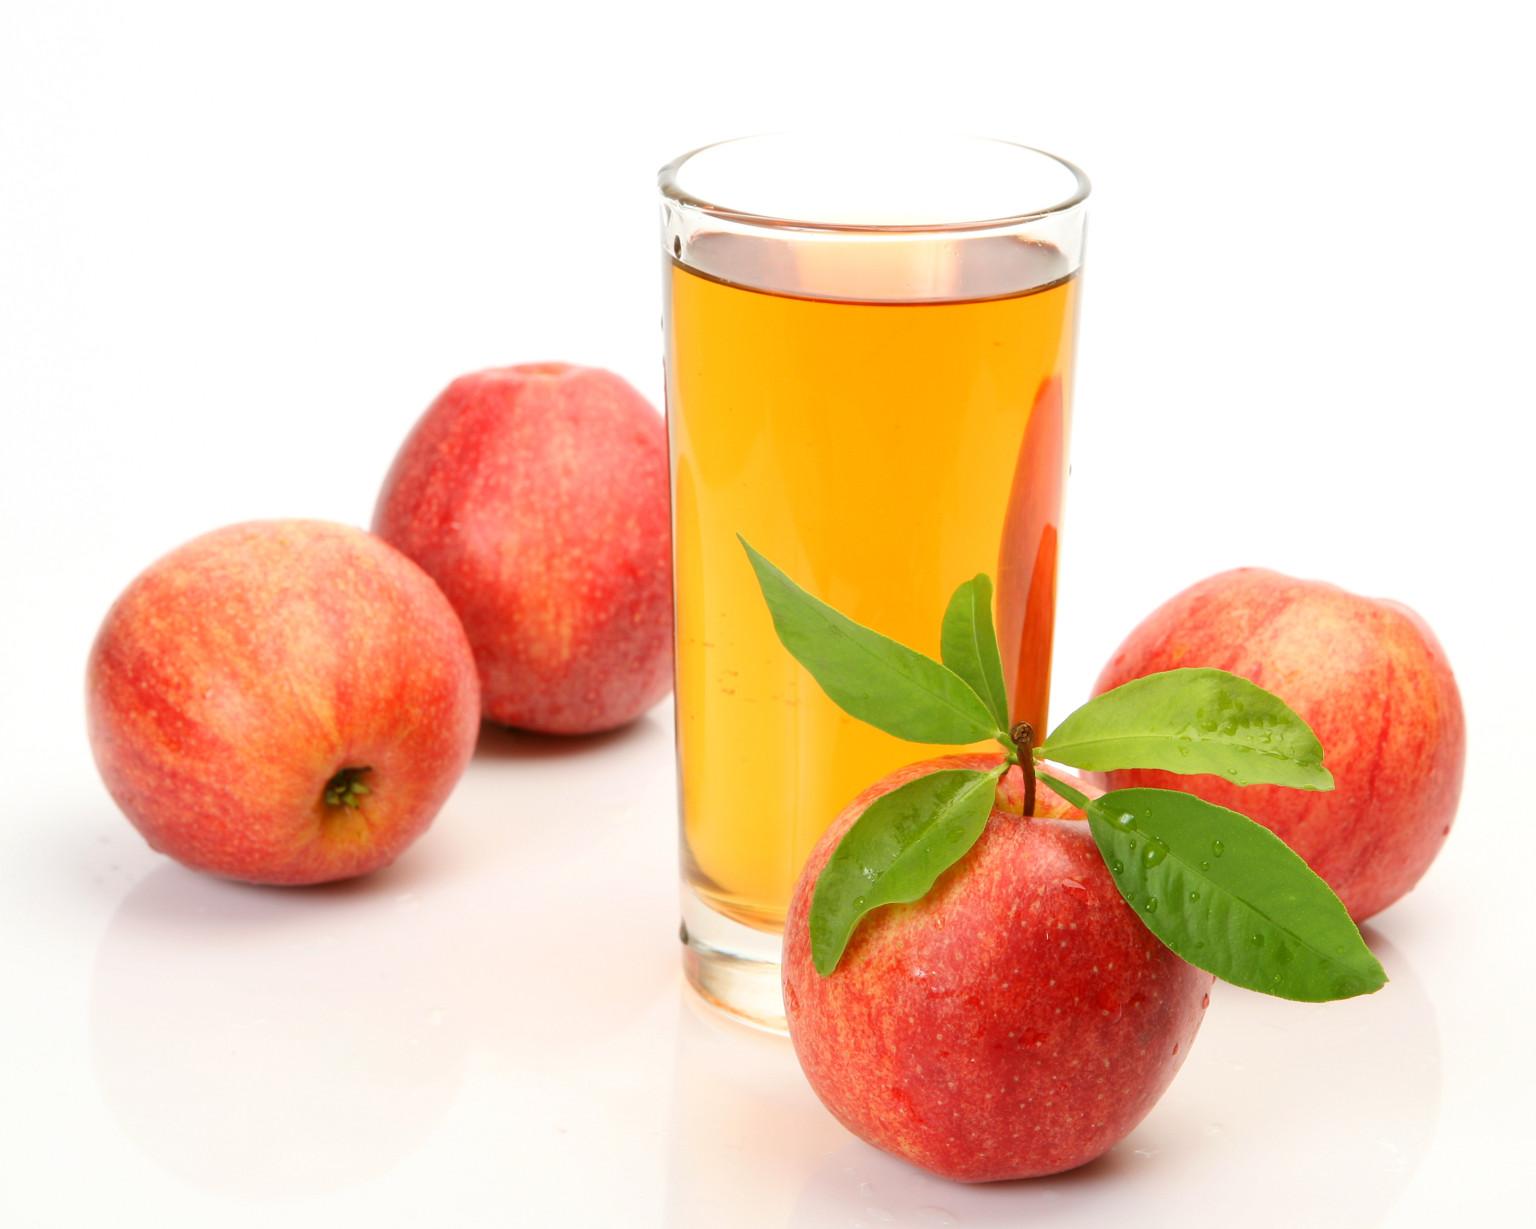 Drinking Grapefruit Juice With Vicodin